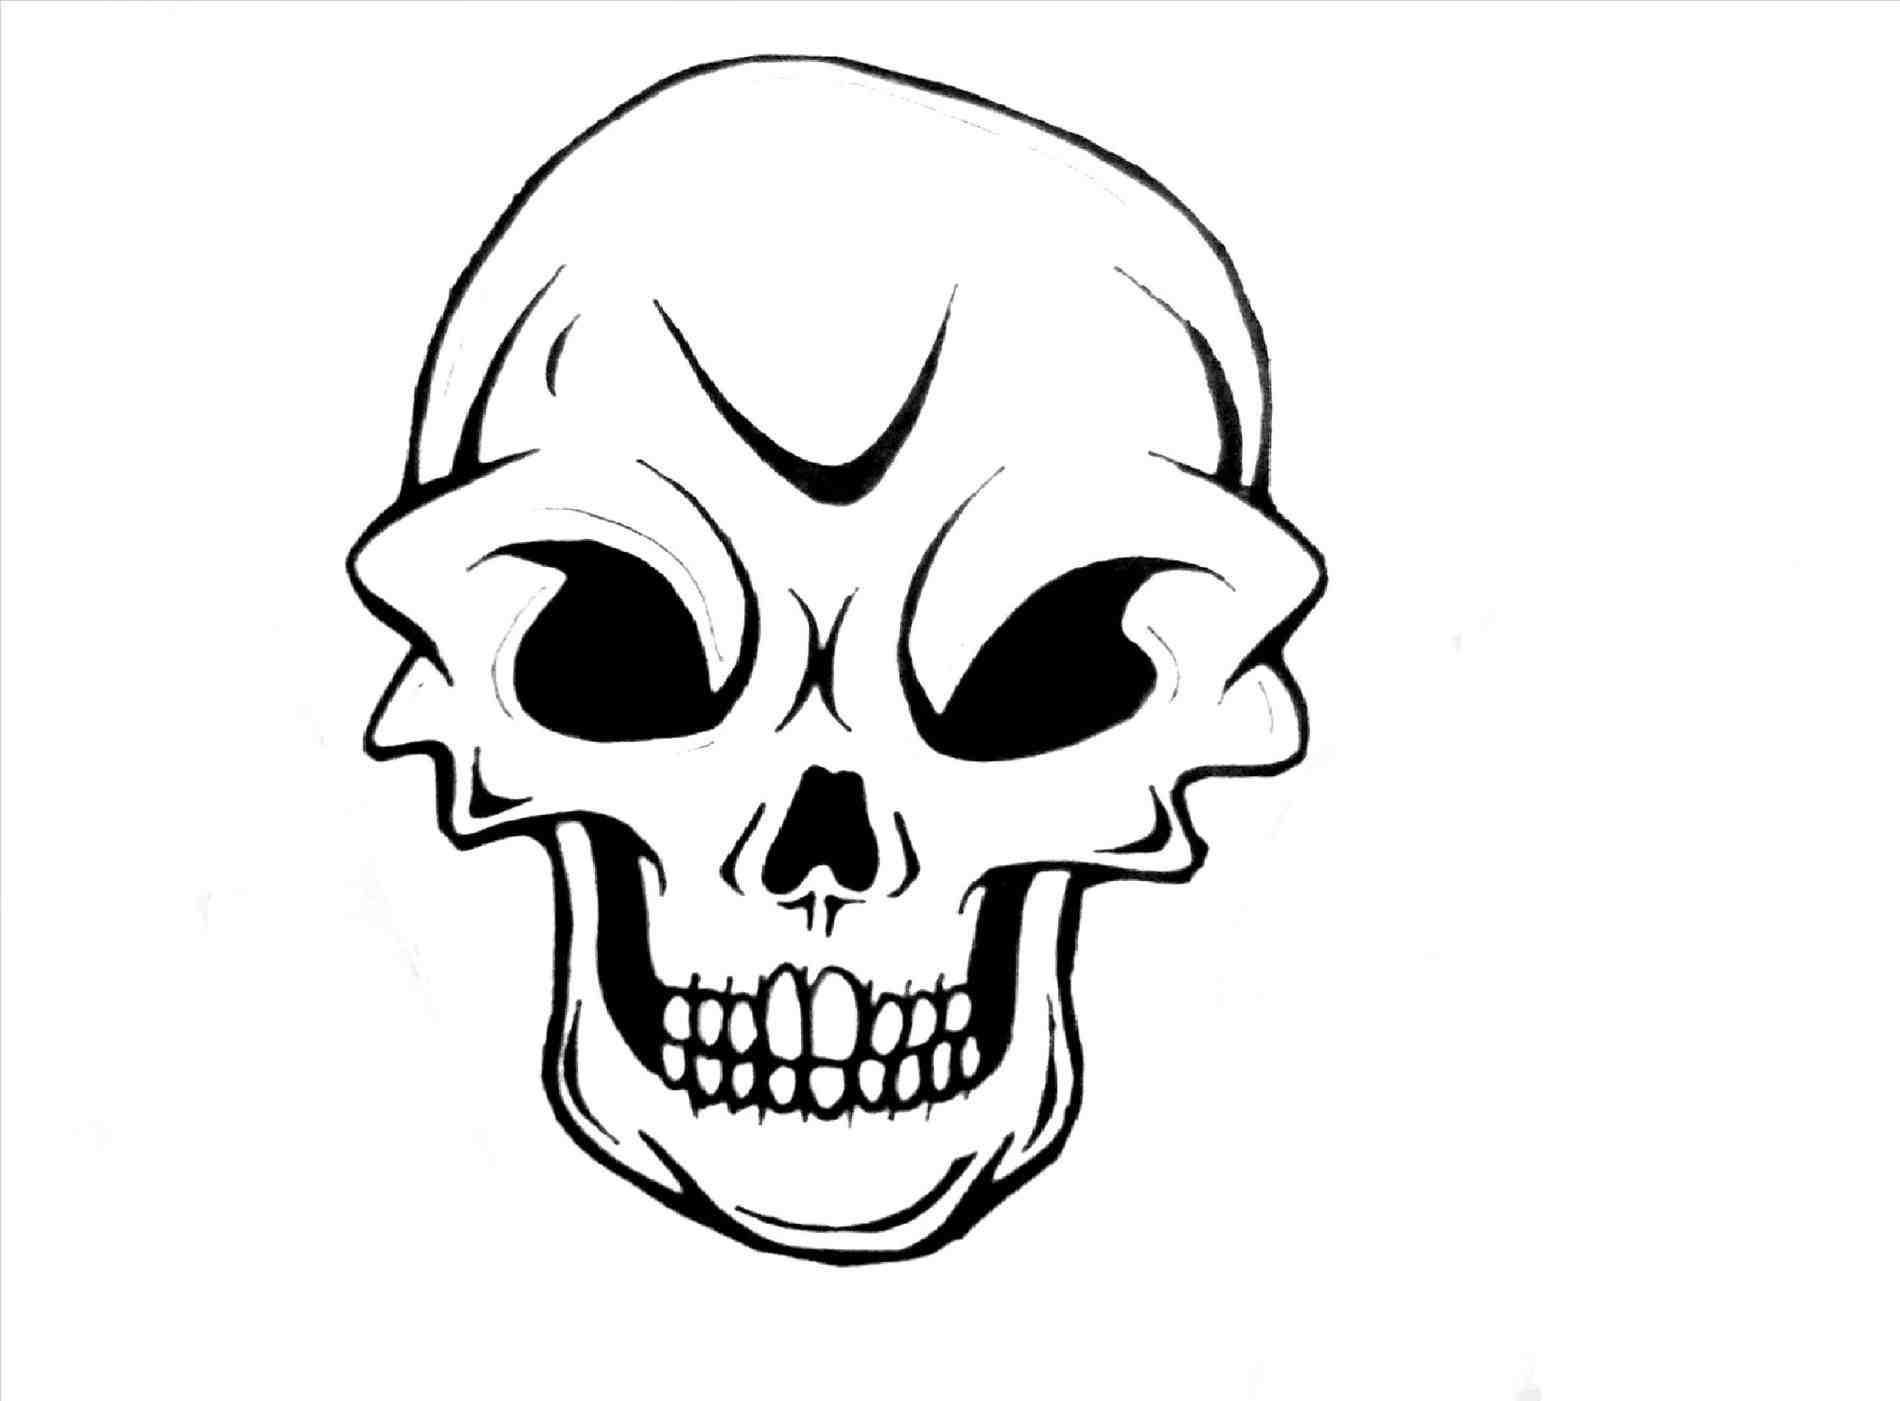 1900x1401 Easy Skull Designs To Draw 1000 Geometric Tattoos Ideas. Easy